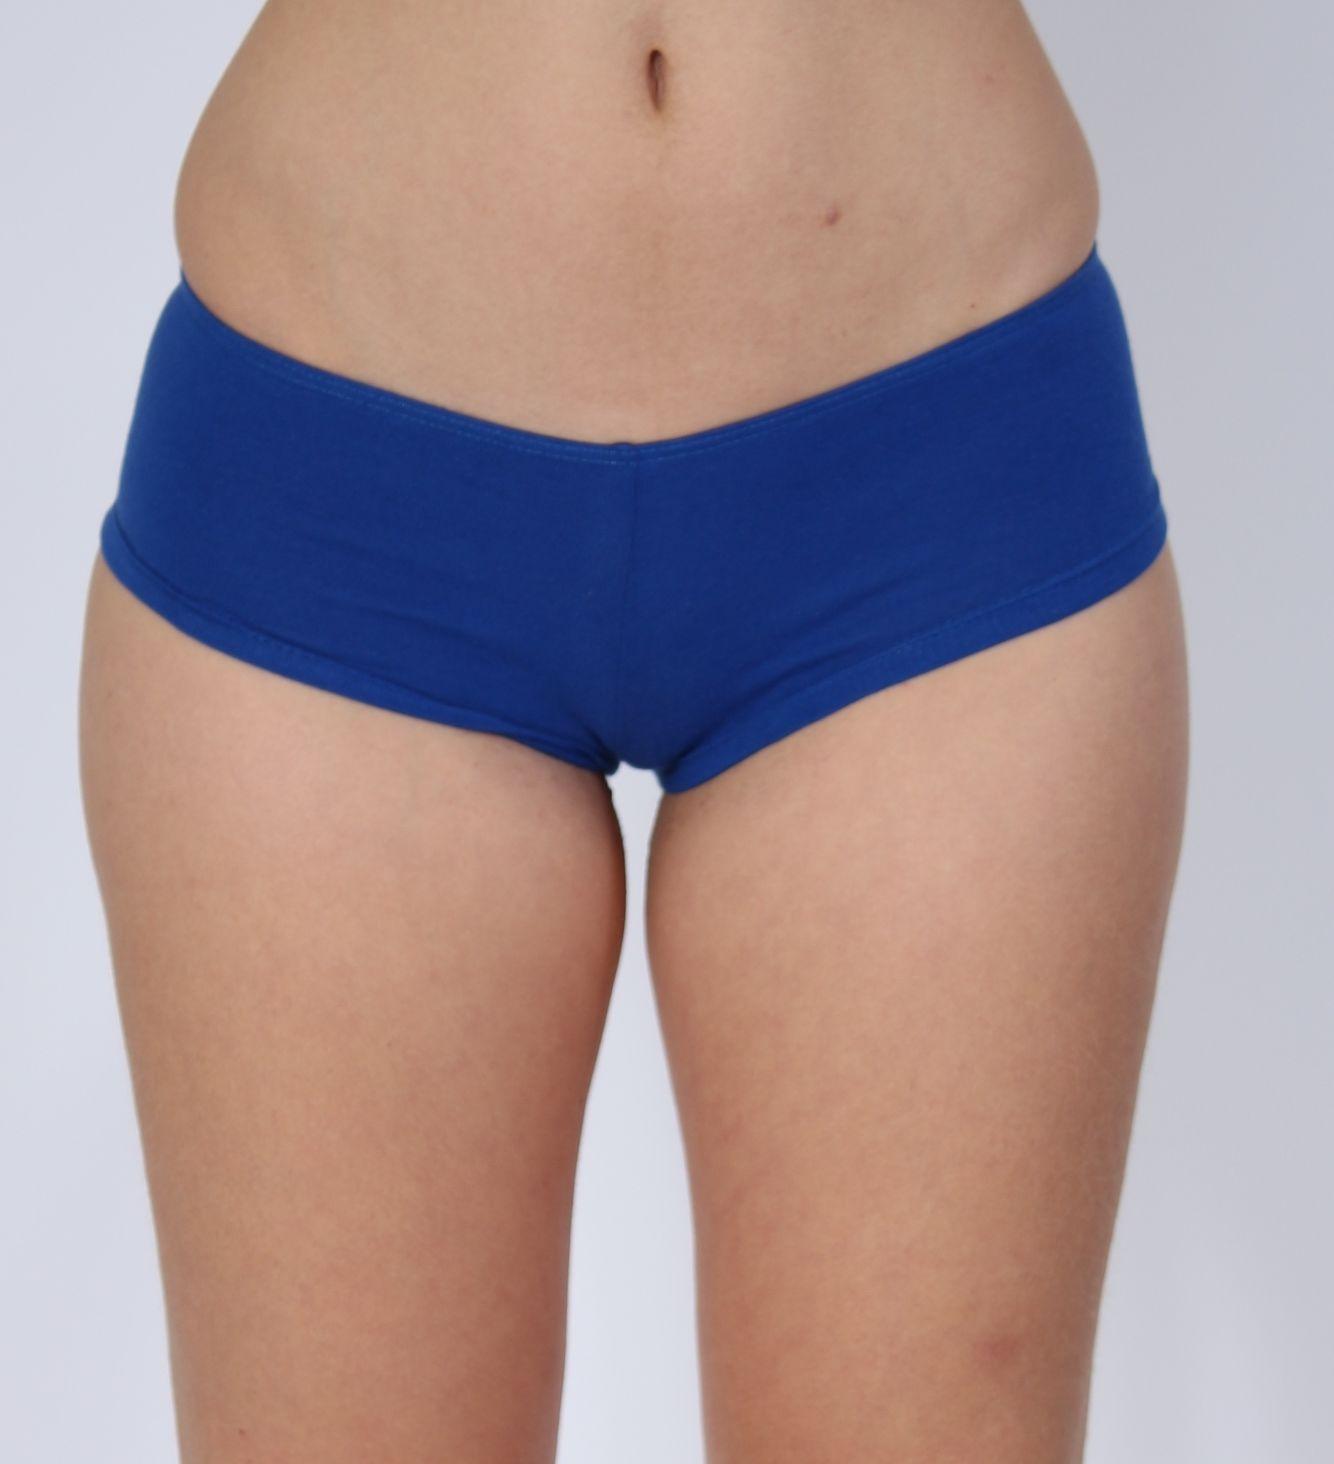 Sexy ass in boy shorts